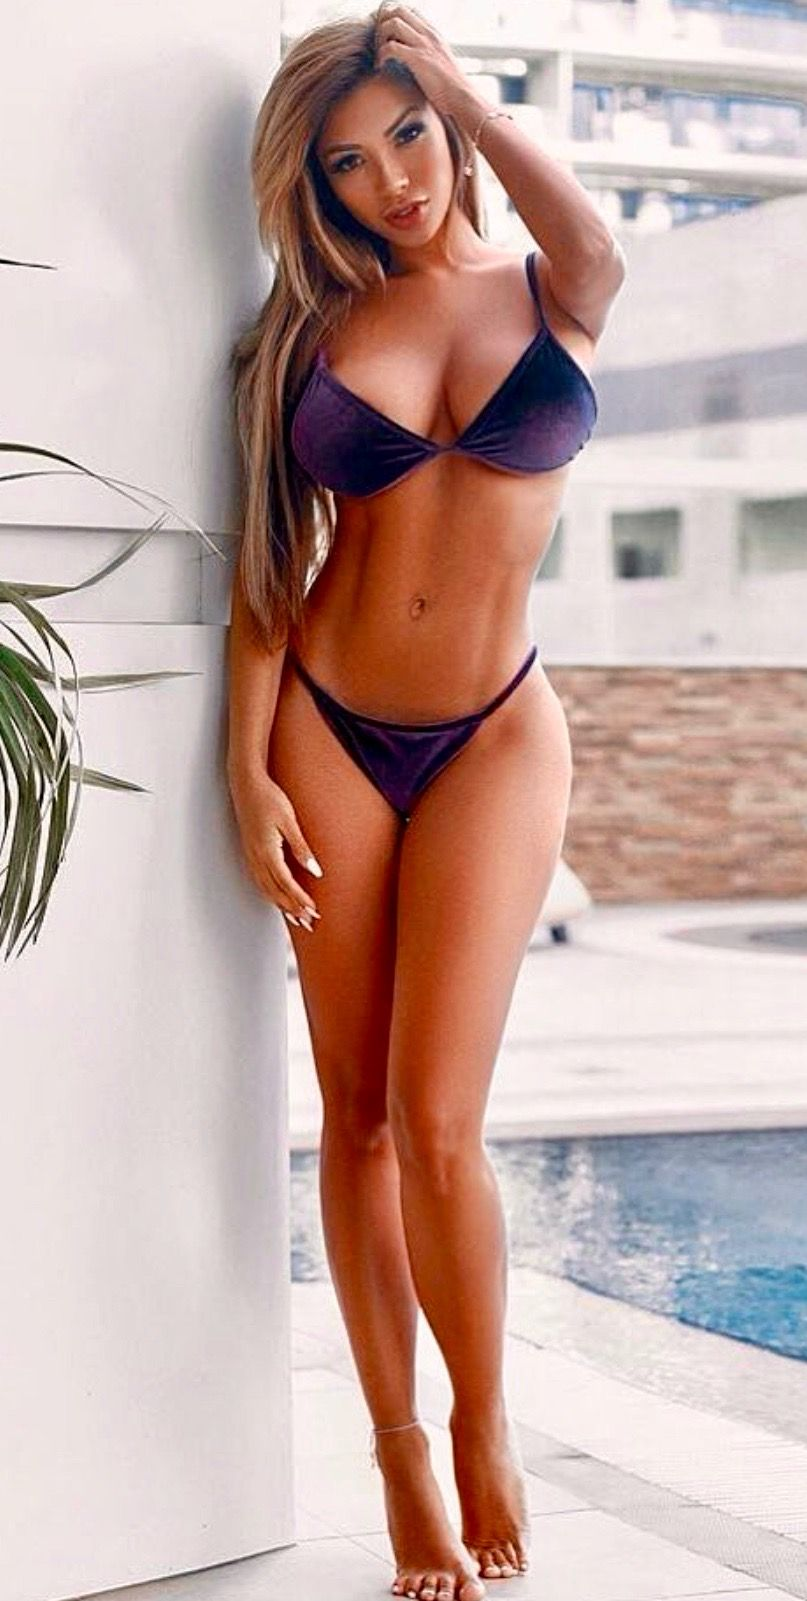 2bb8c97bc7632 #sexy #women #girls #bikini #hot Pin by #ruithmar